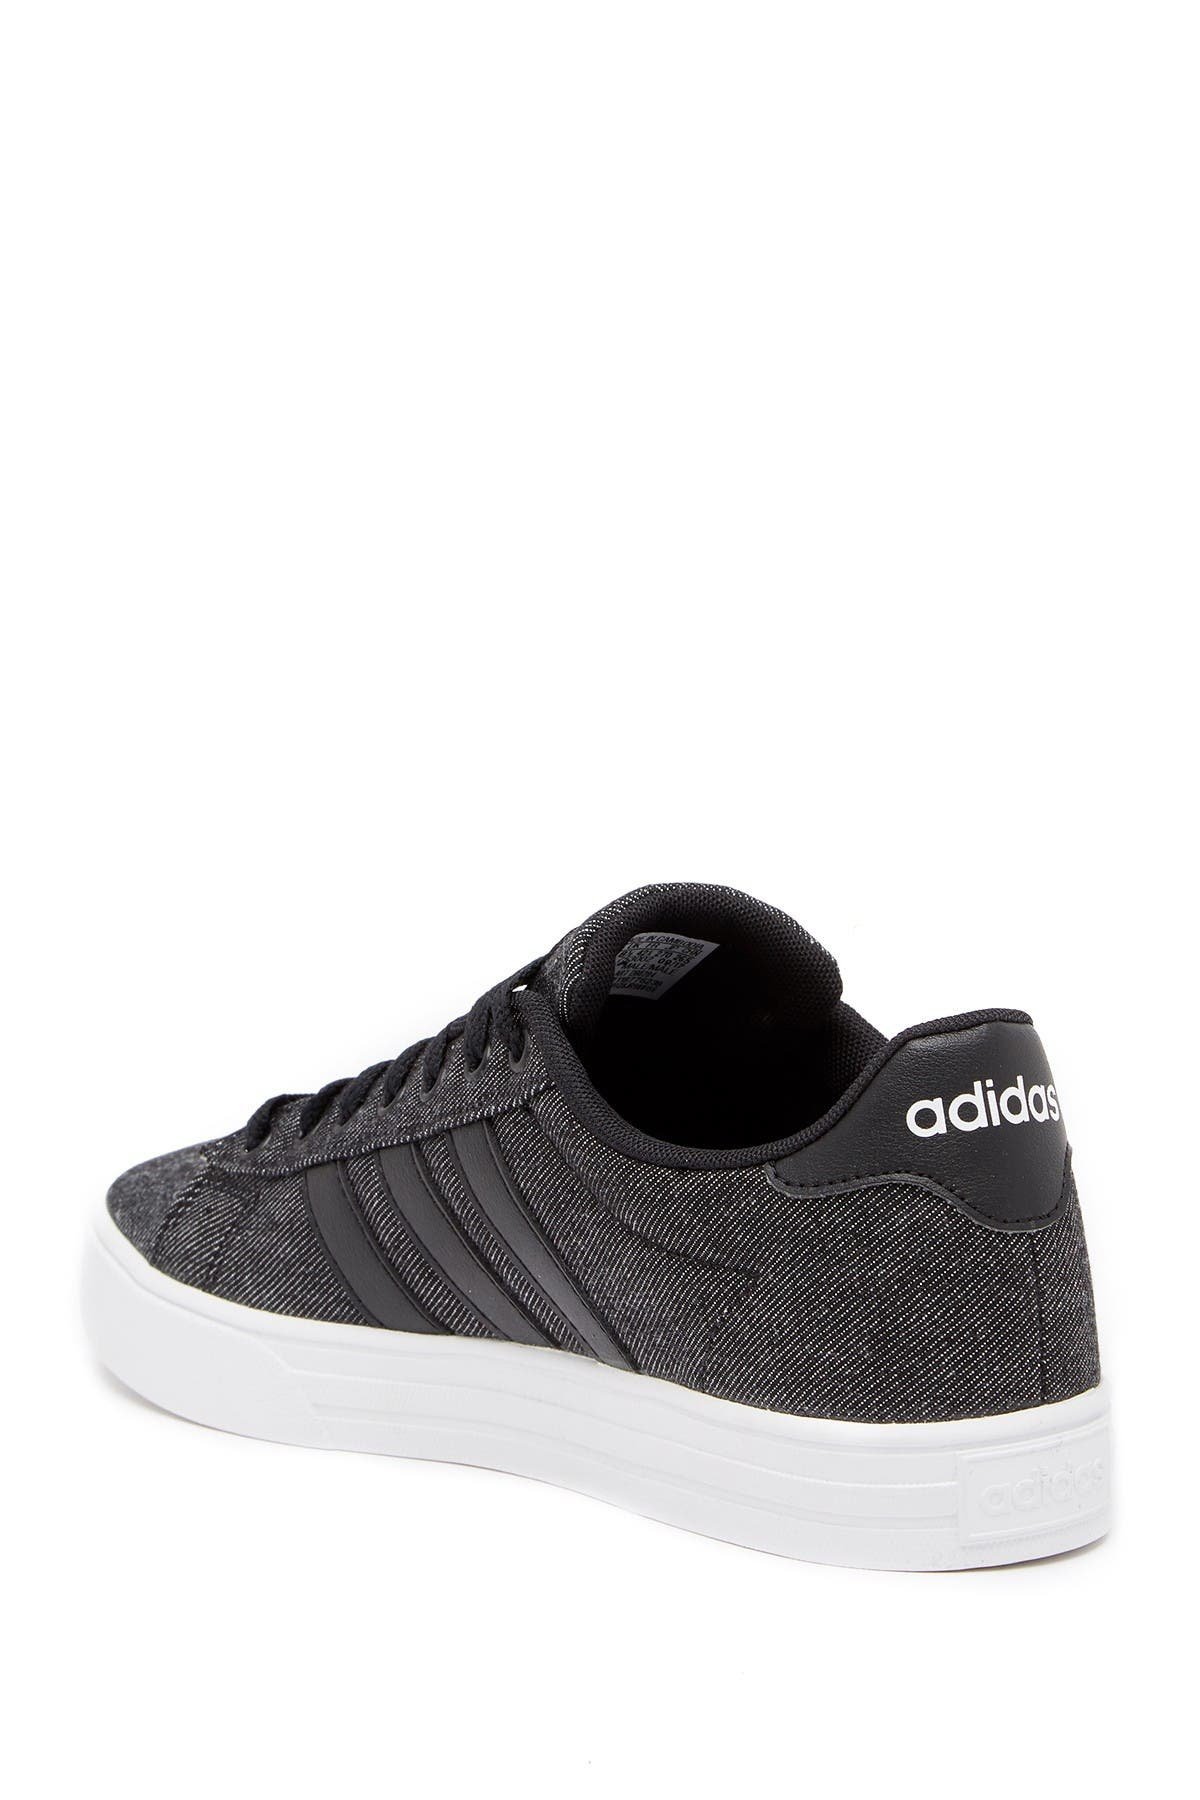 adidas | Daily 2.0 Denim Sneaker